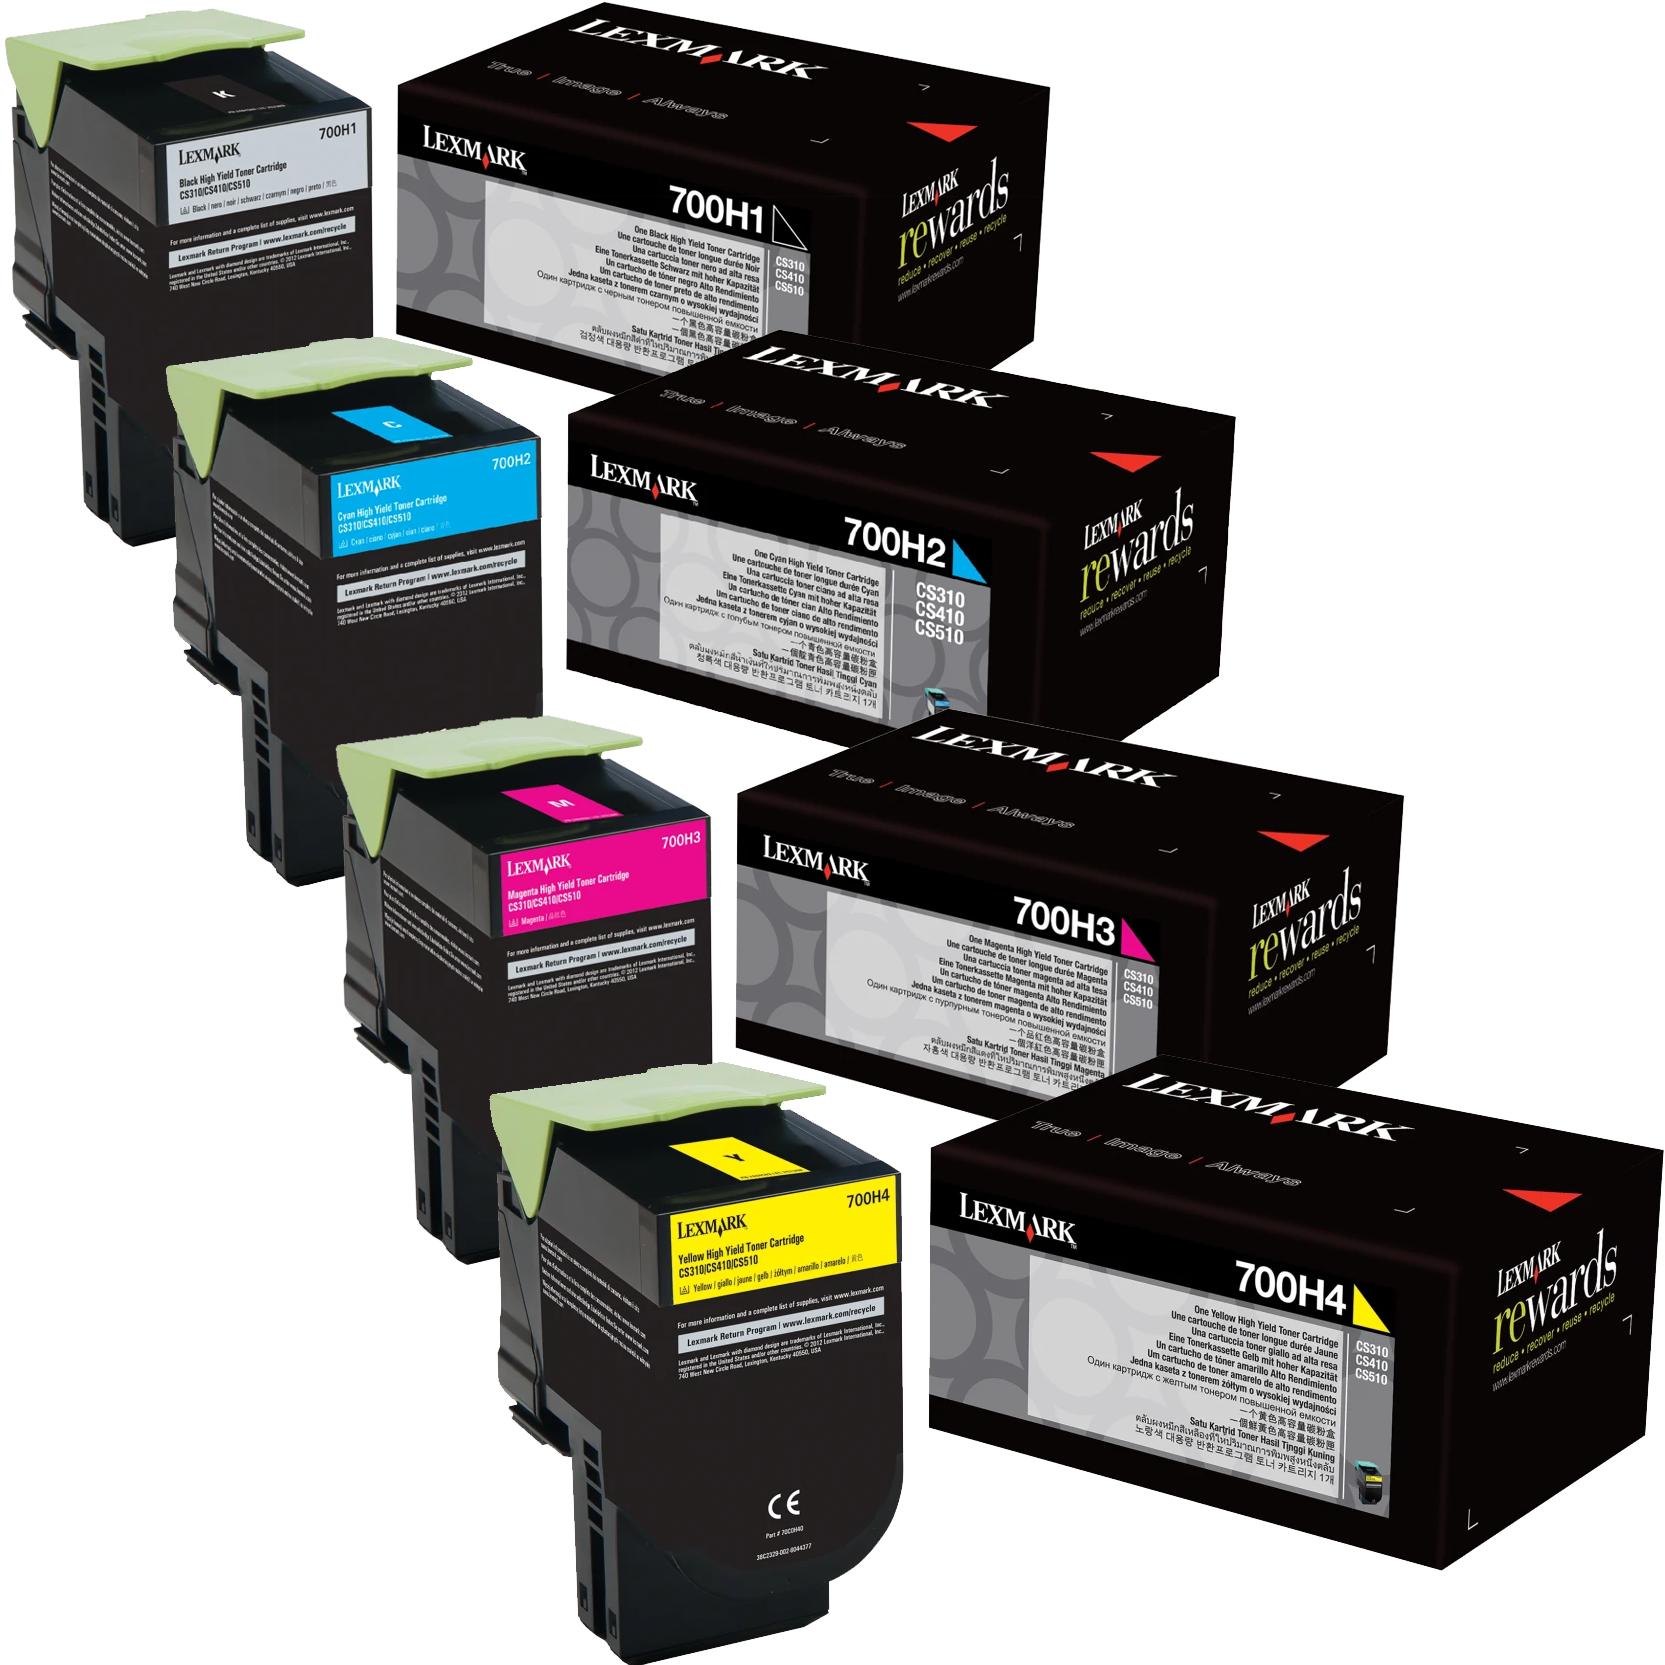 Lexmark 700H Set   70C0H10 70C0H20 70C0H30 70C0H40   Original Lexmark High-Yield Toner Cartridges – Black, Cyan, Magenta, Yellow